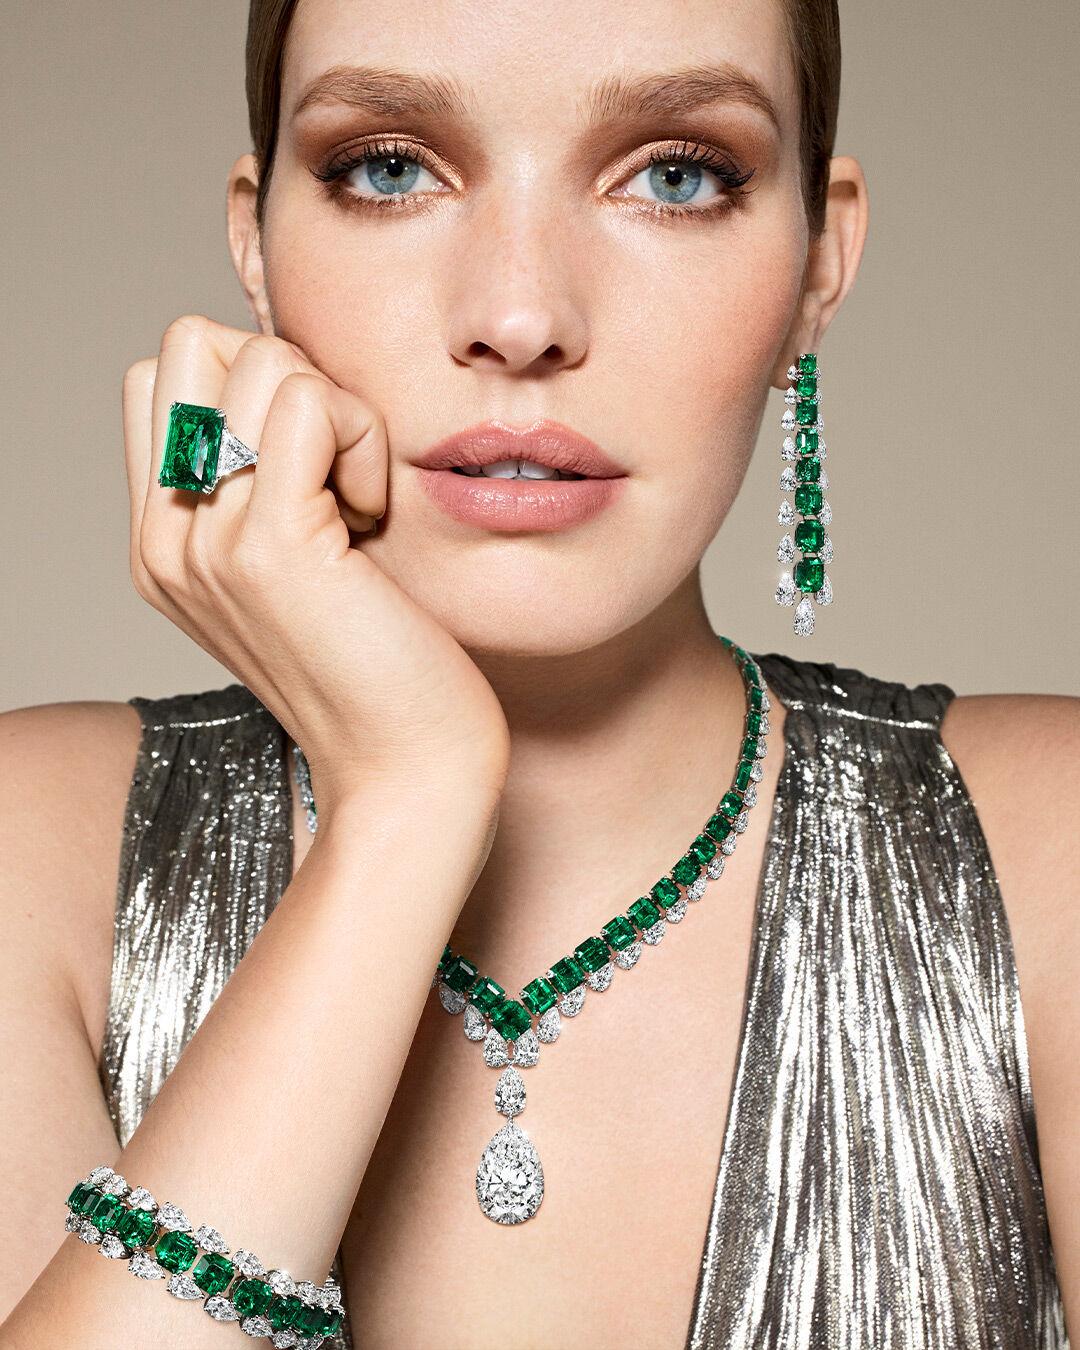 Model wears Graff emerald and white diamond high jewellery